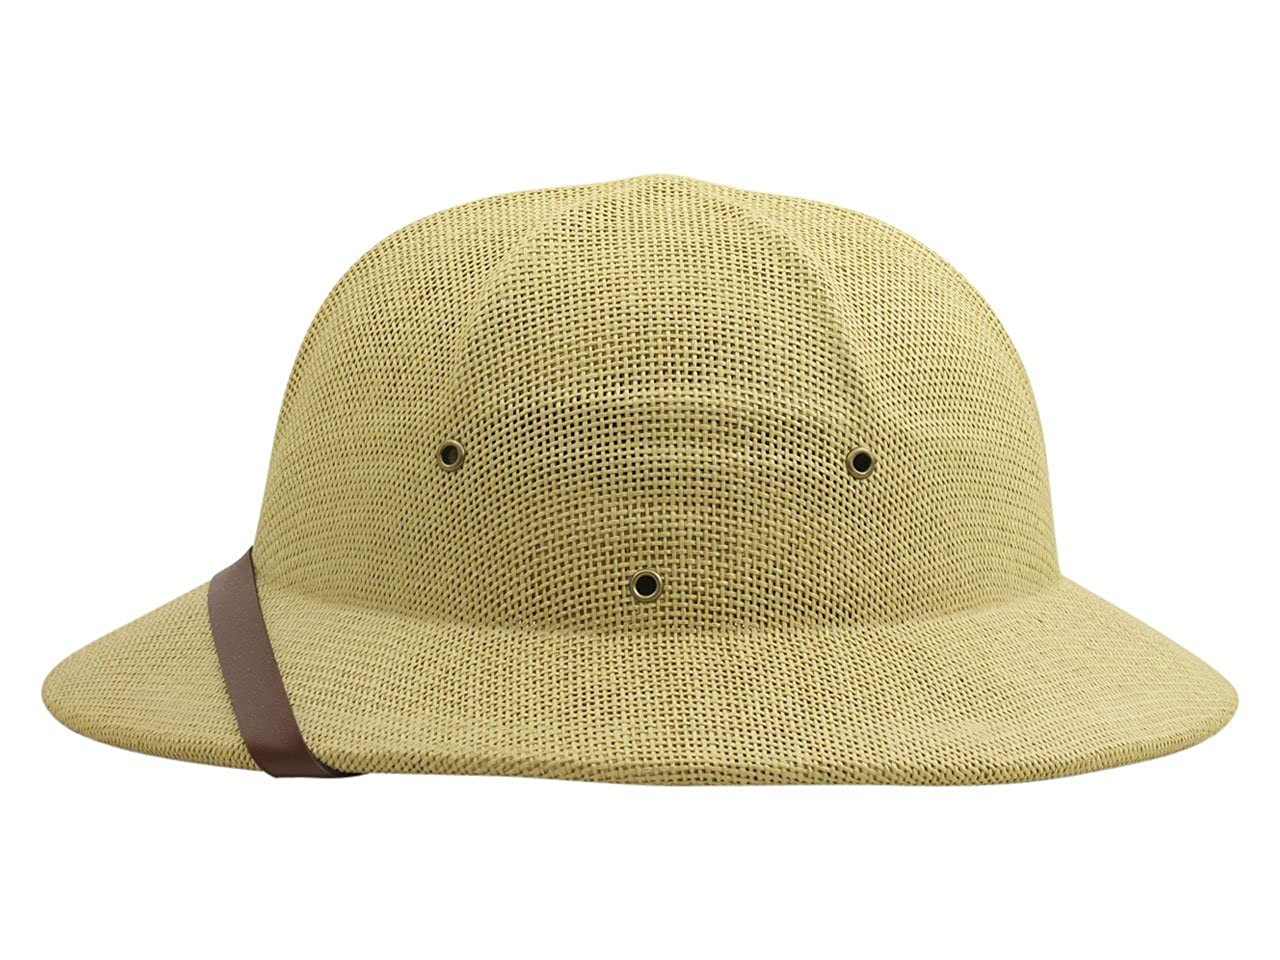 Dorfman Pacific Co Mens Fine Twisted Toyo Pith Helmet